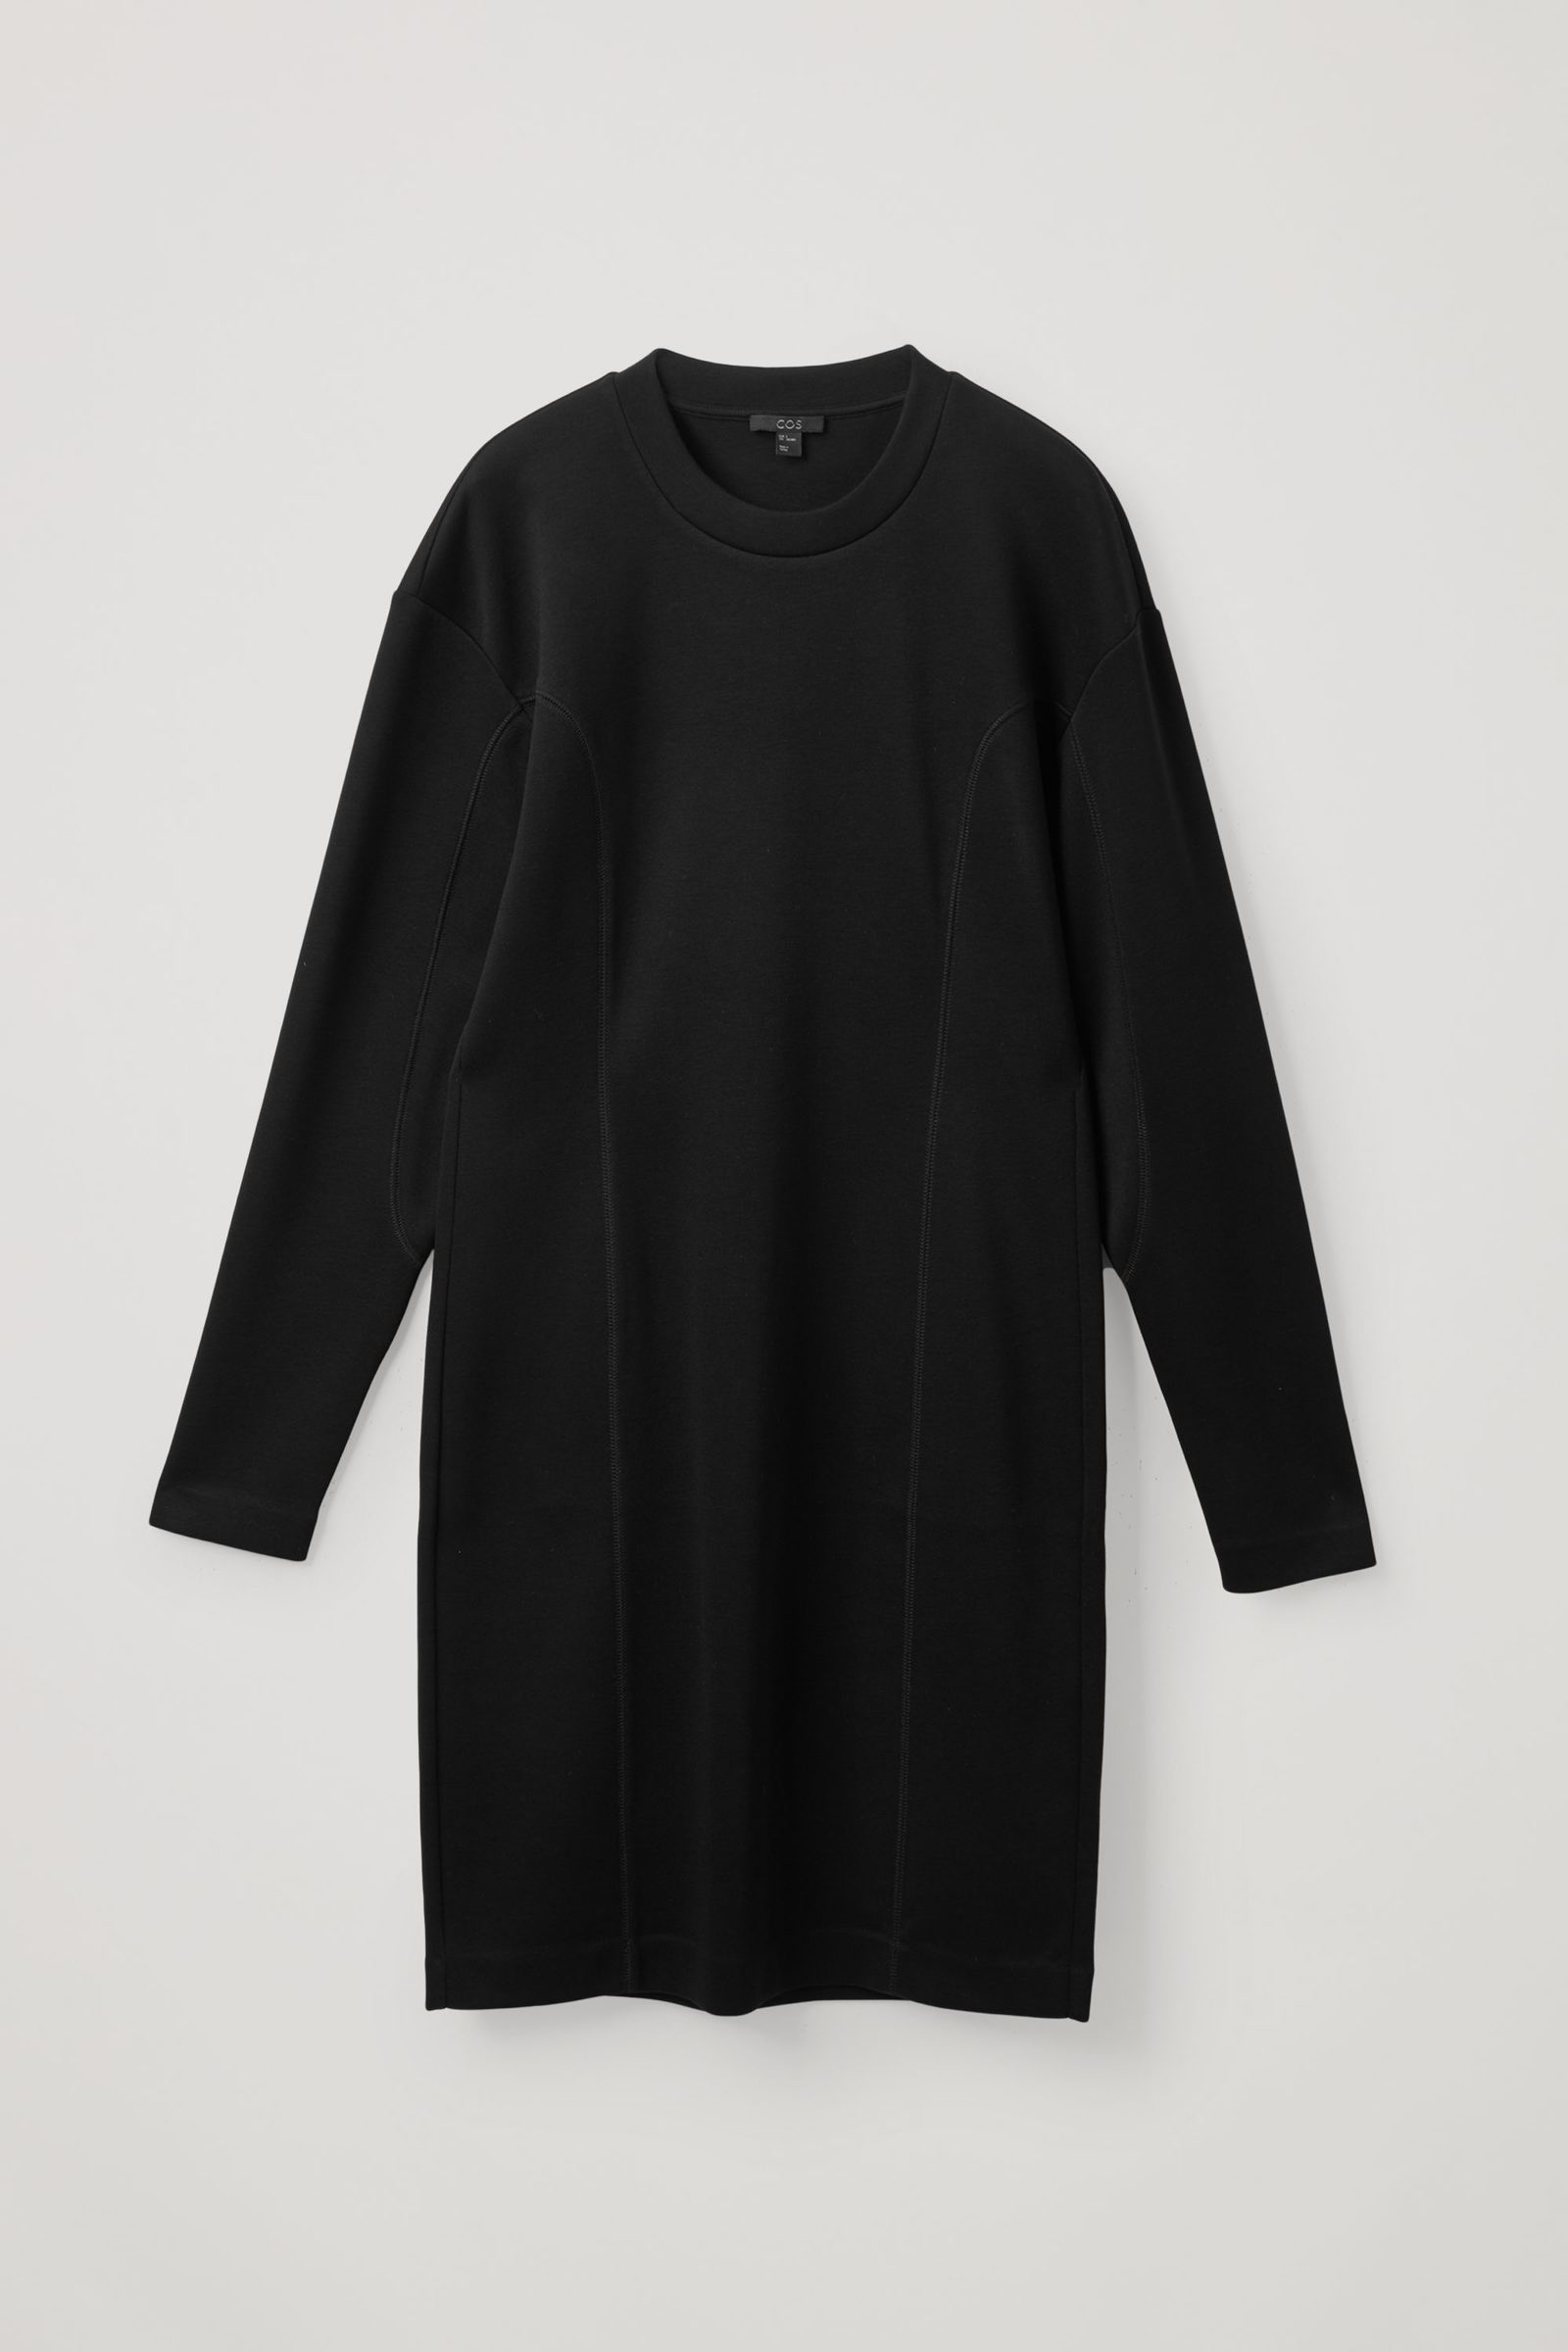 COS 테크니컬 커브드 패널 스웻셔츠 드레스의 블랙컬러 Product입니다.